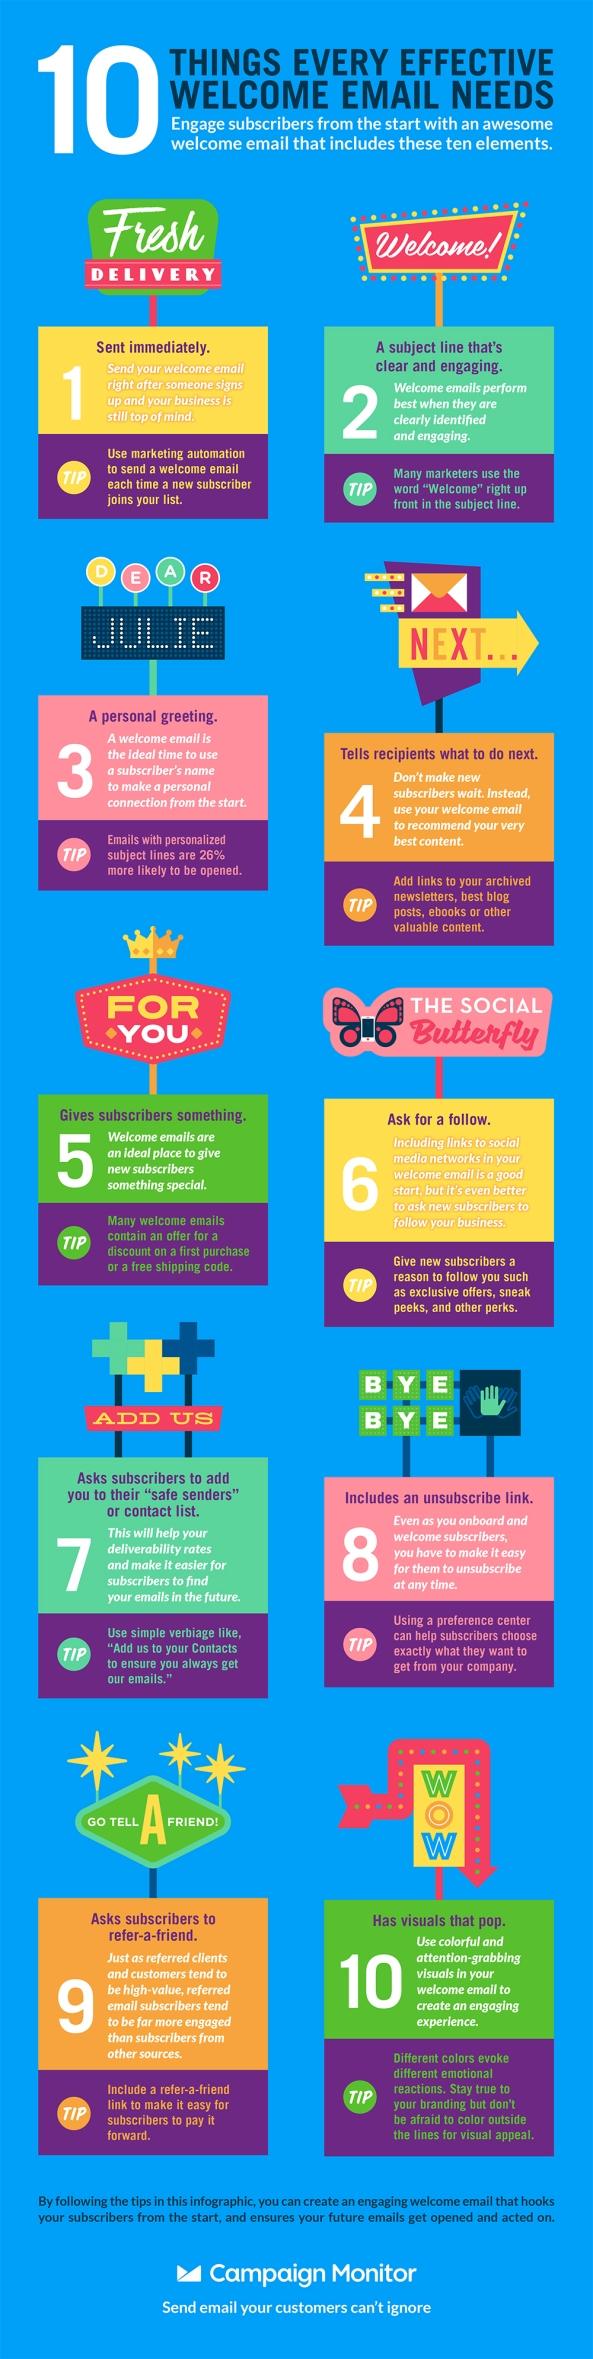 10TEEWEN-infographic-vFinal-1000x3979.jpg